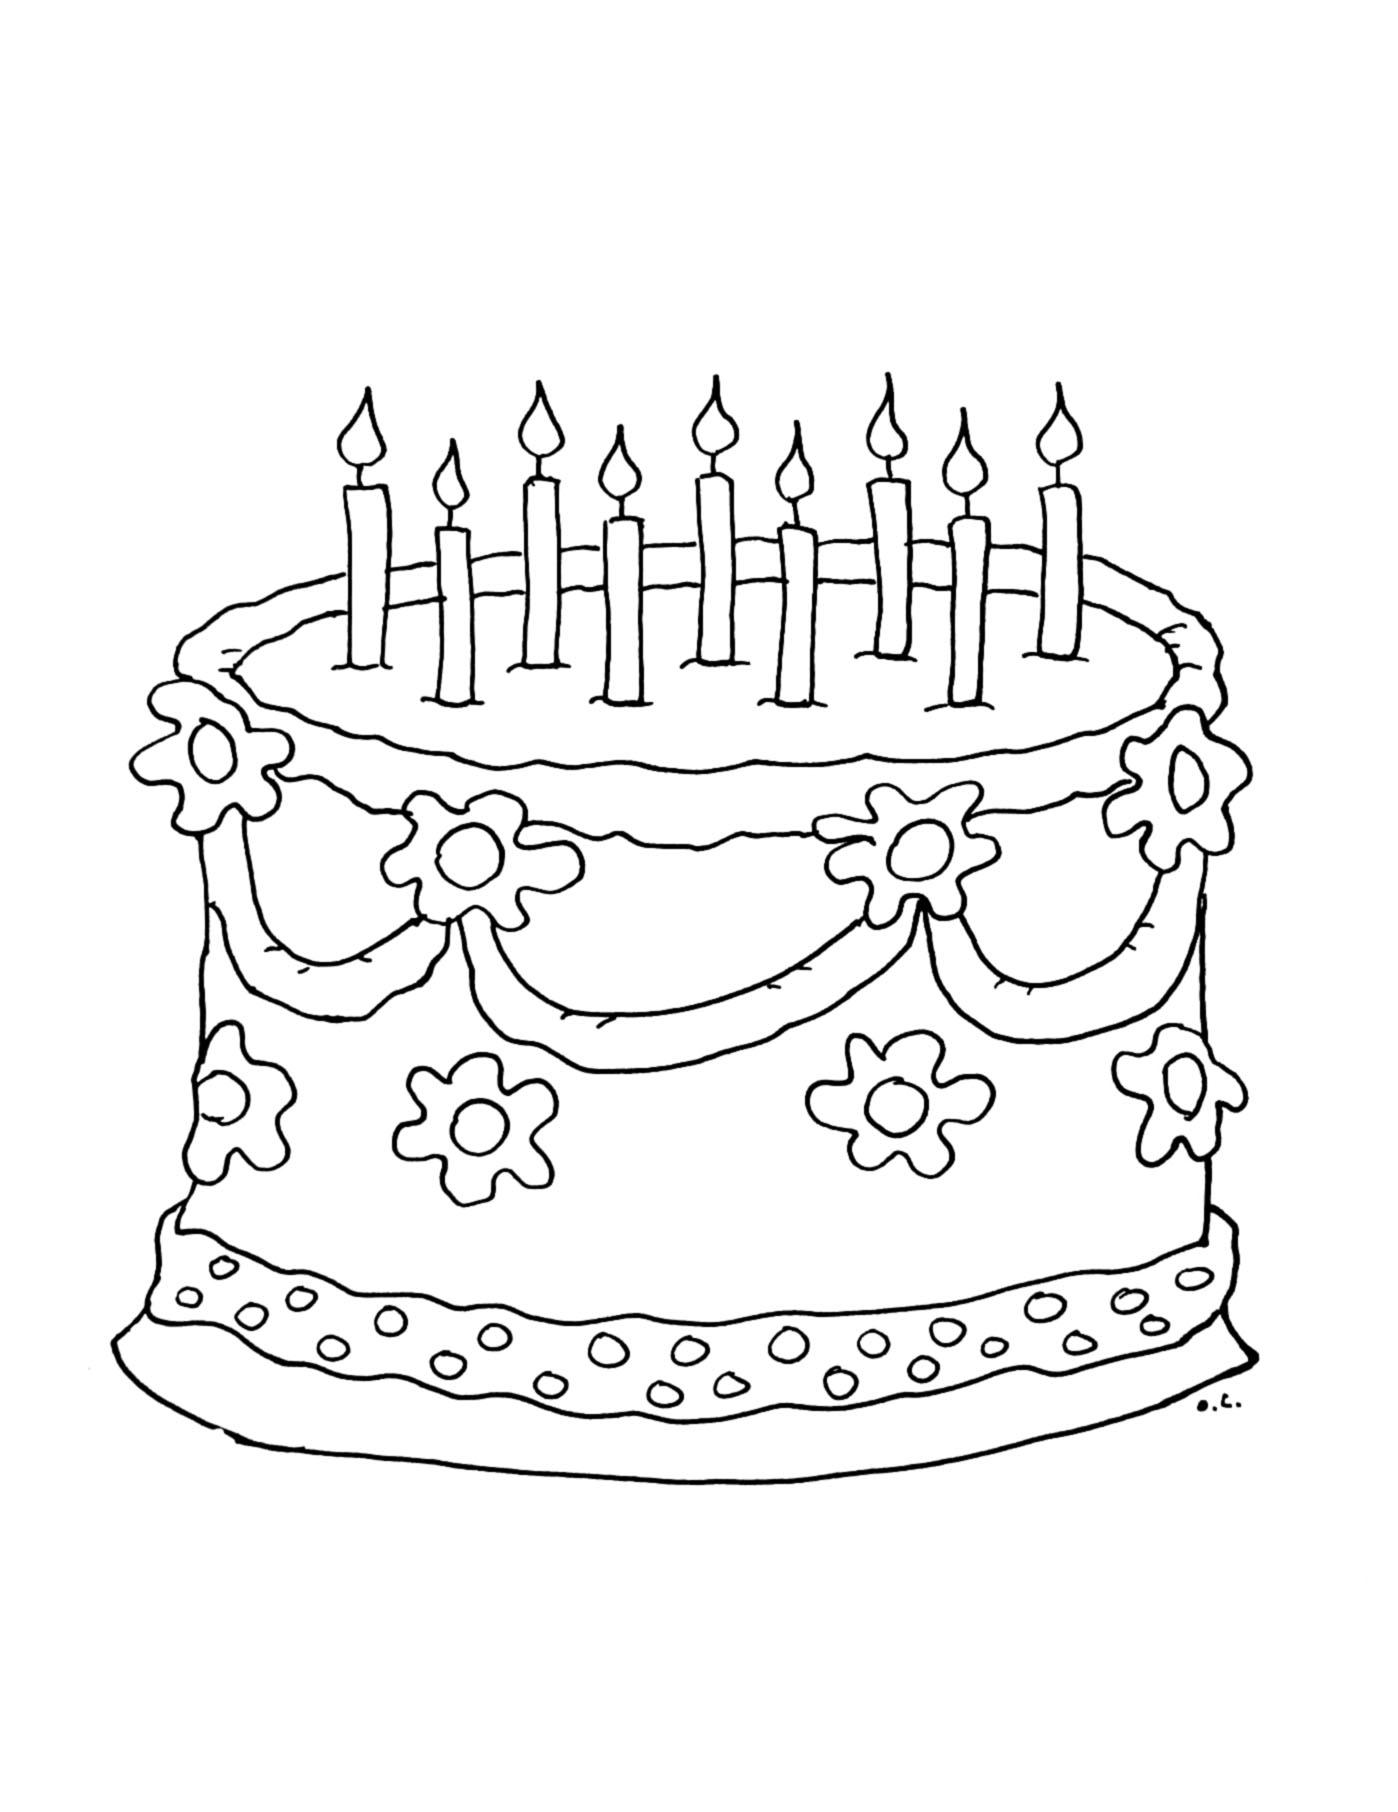 Coloriage gateau bougies